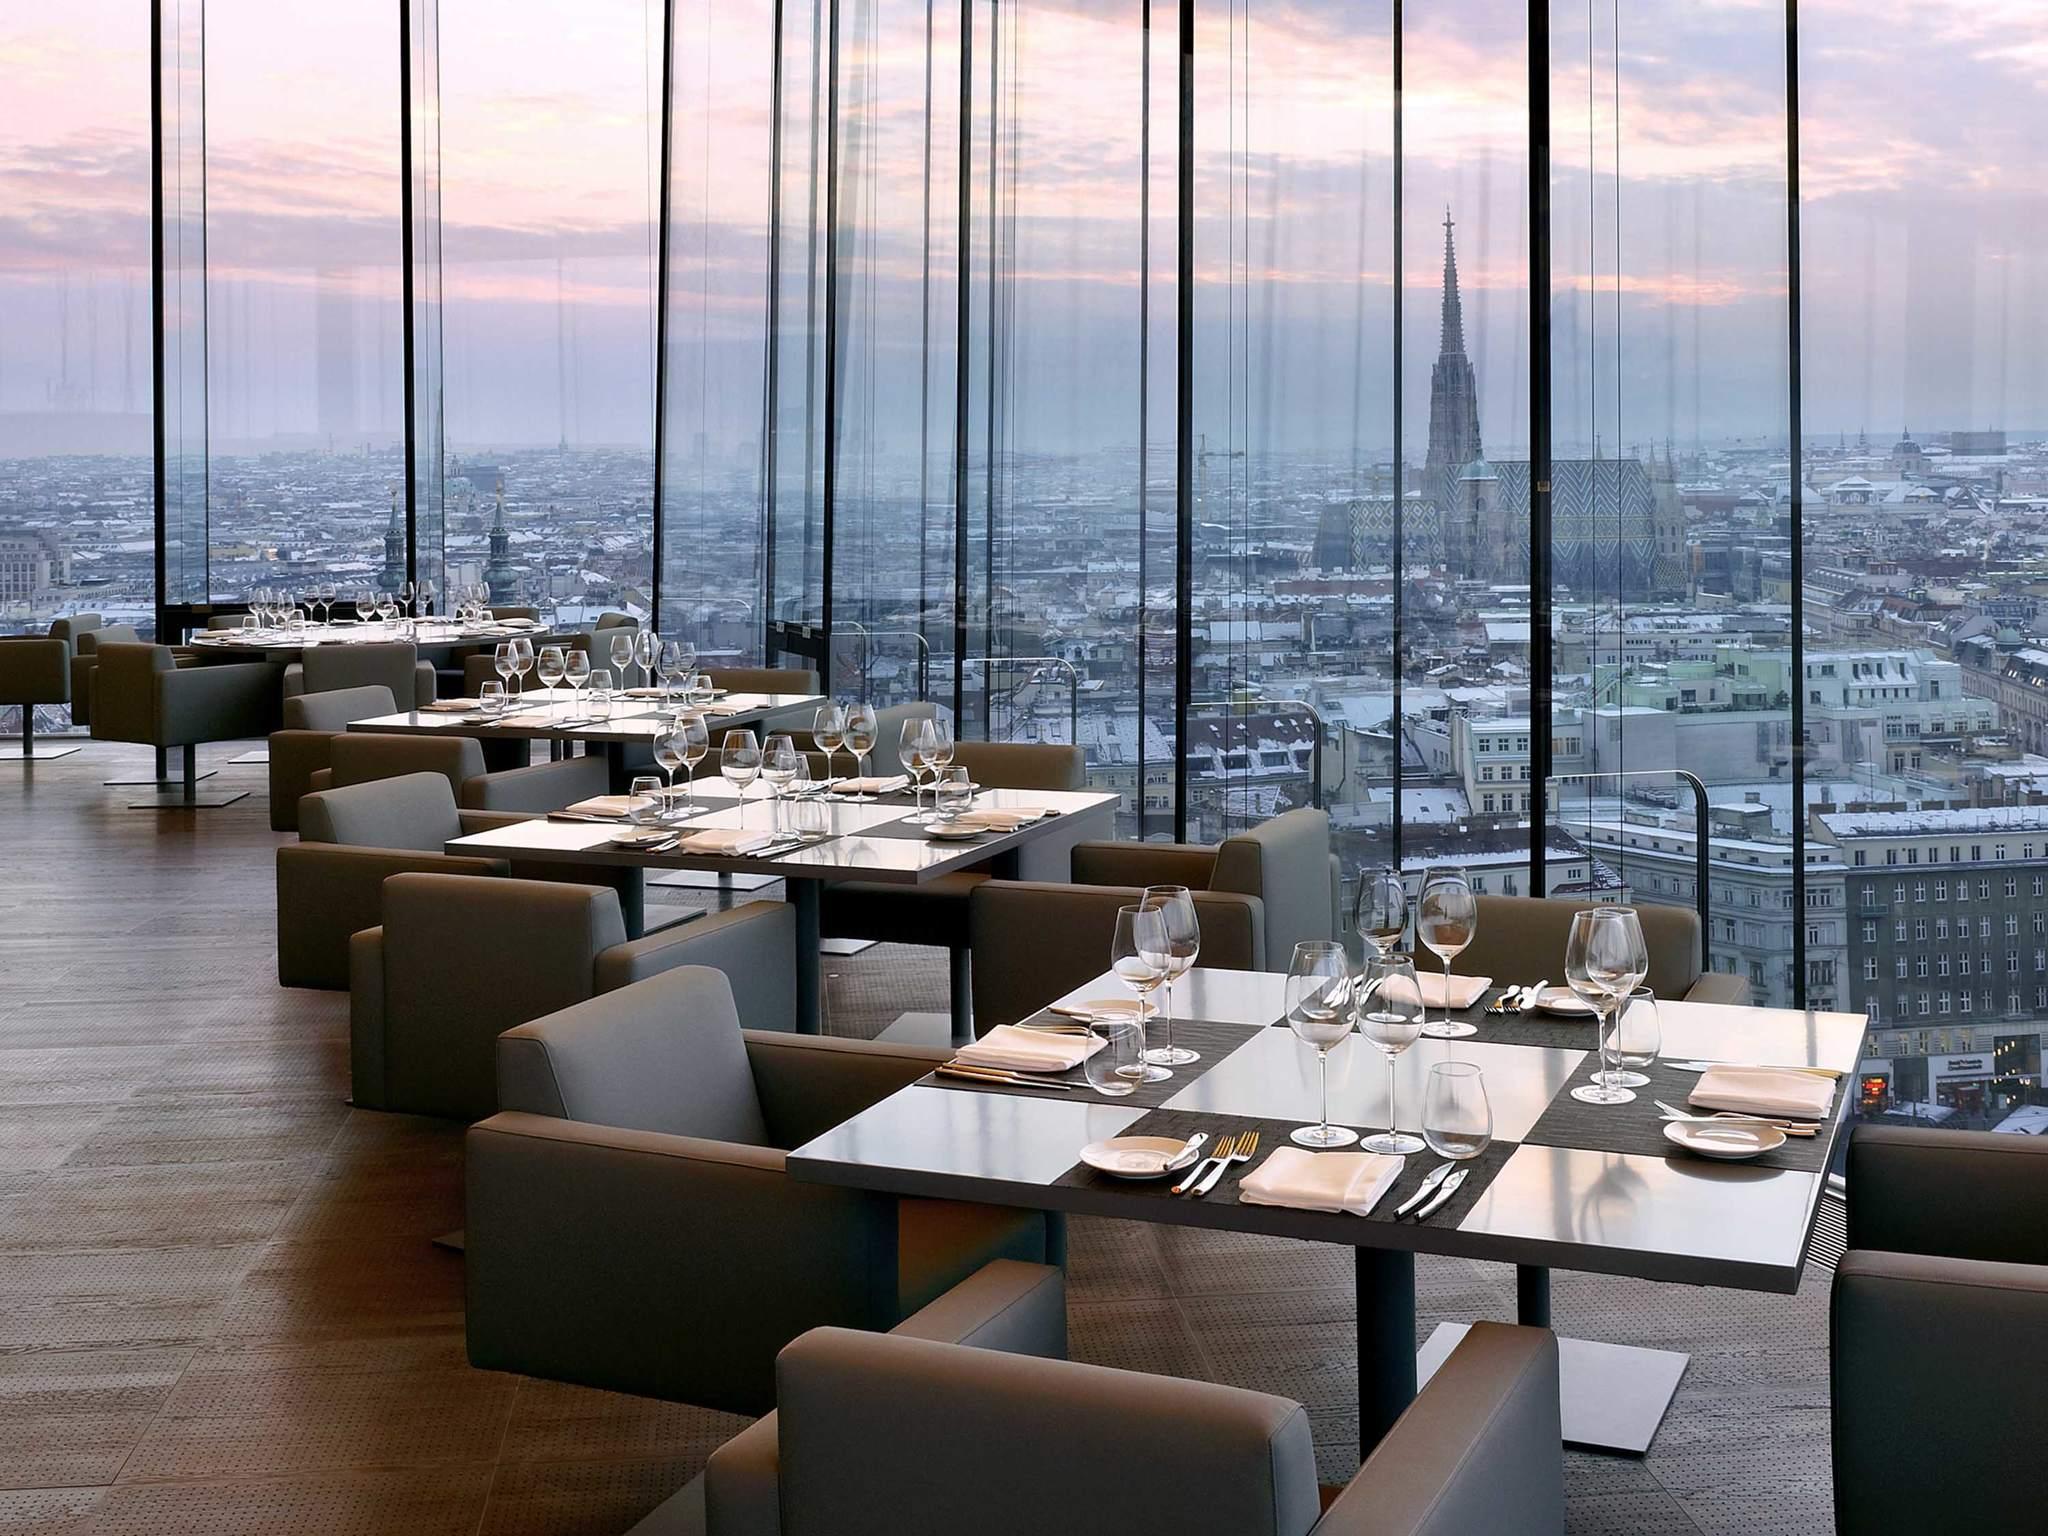 Sofitel Vienna Stephansdom - Lifestyle Hotel Vienna   ACCOR